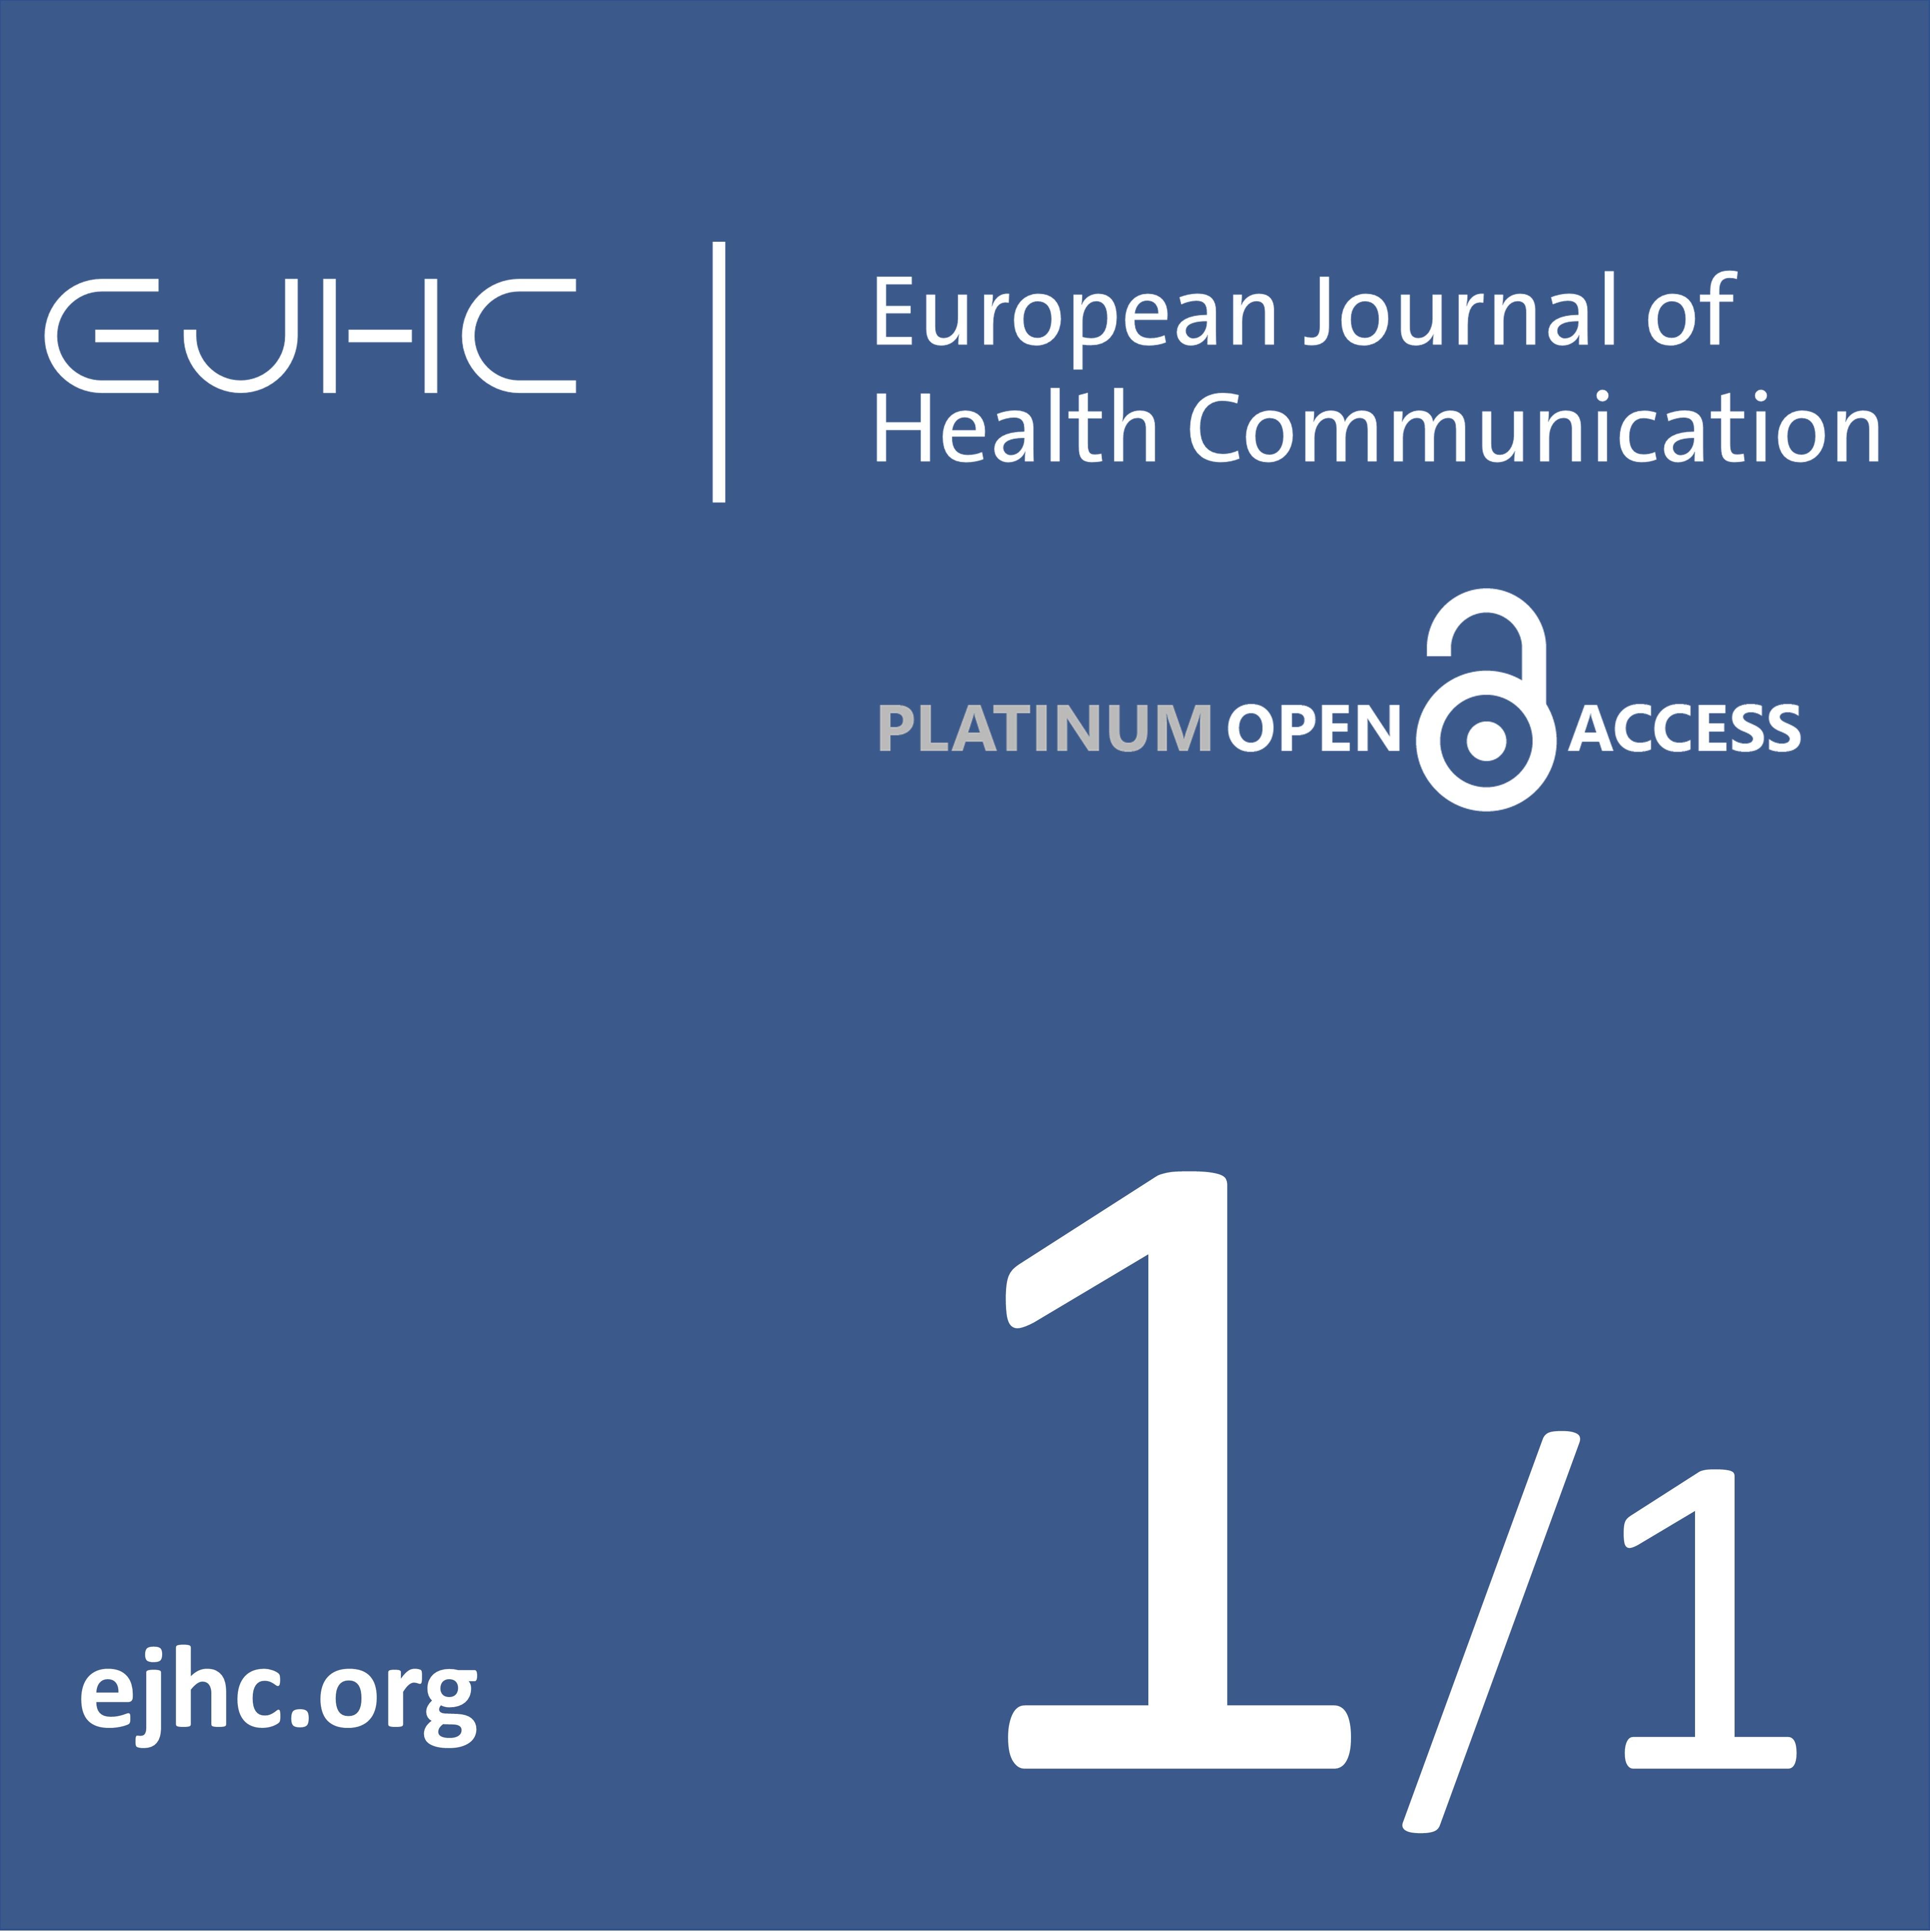 EJHC - European Journal of Health Communication